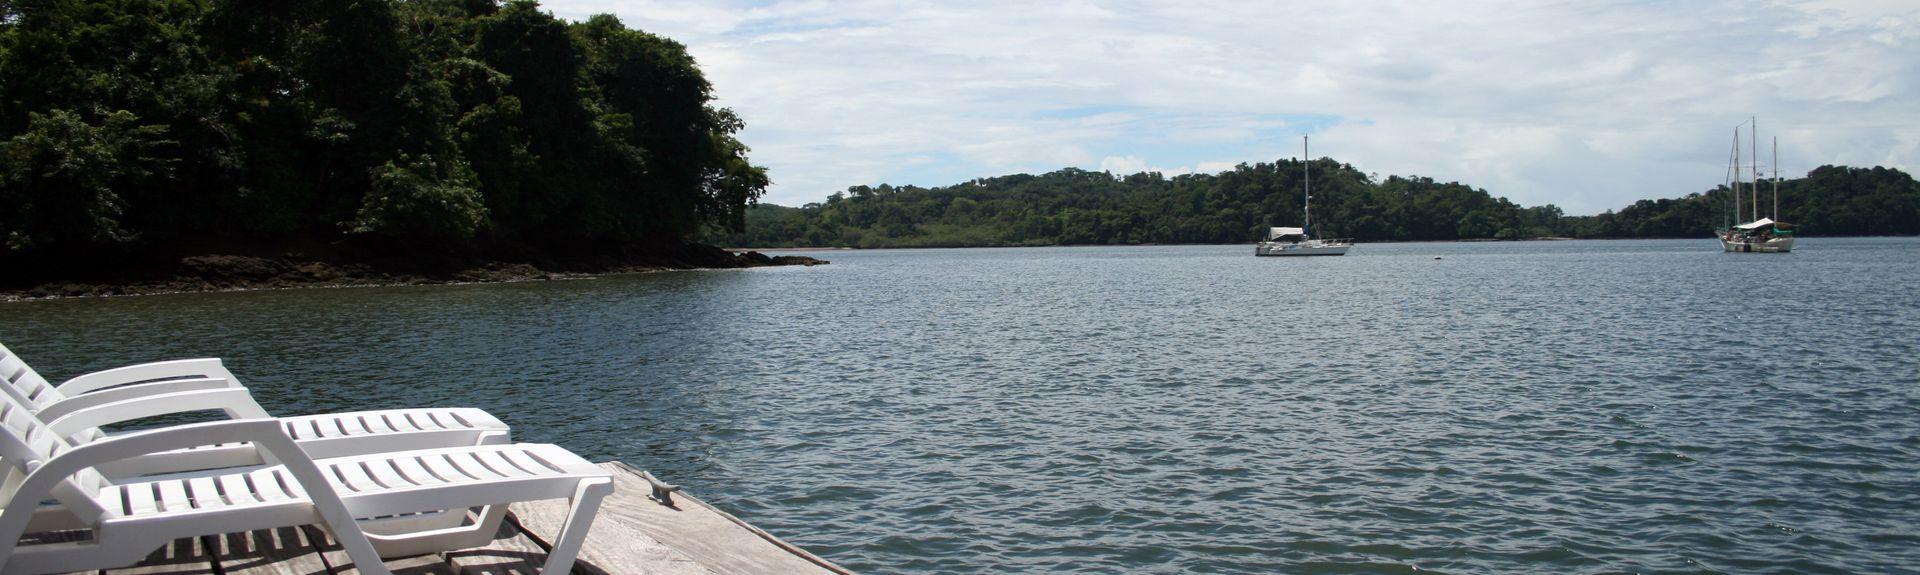 Boca Chica, Chiriquí (province), Panama